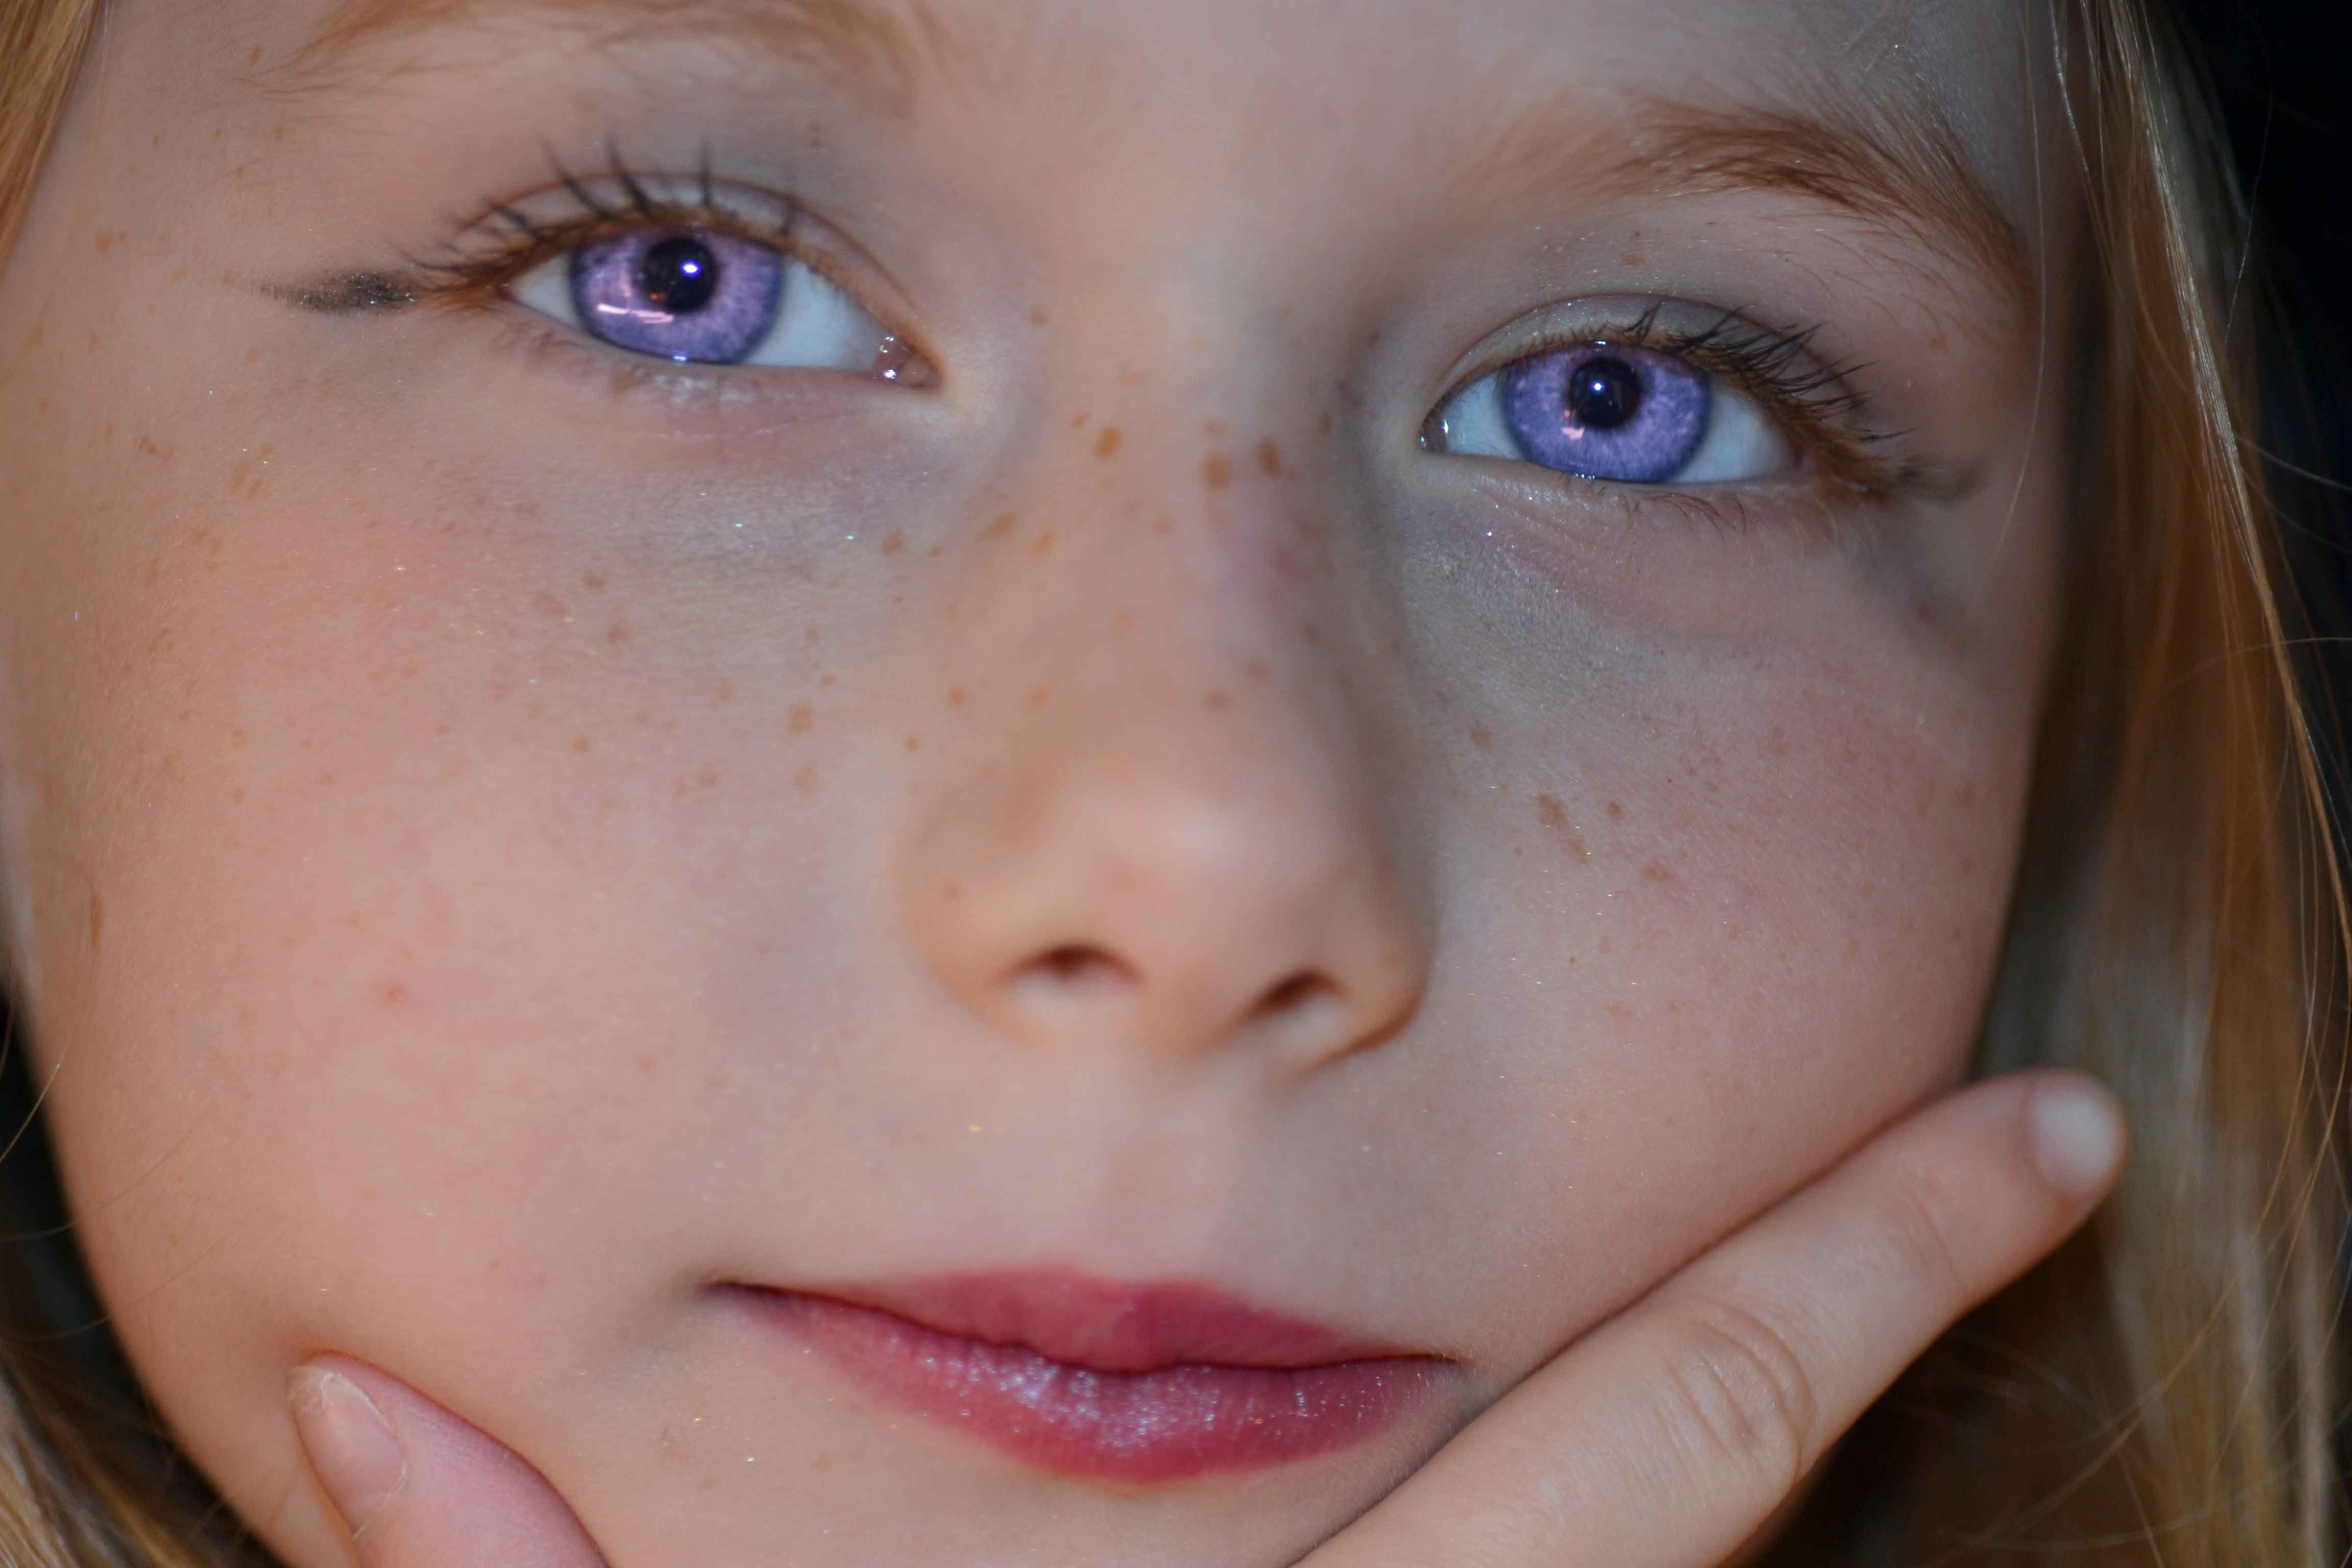 Violet eyes ~ You realize Alexandria's Genesis isn't real, right? http://www.snopes.com/politics/medical/alexandriasgenesis.asp